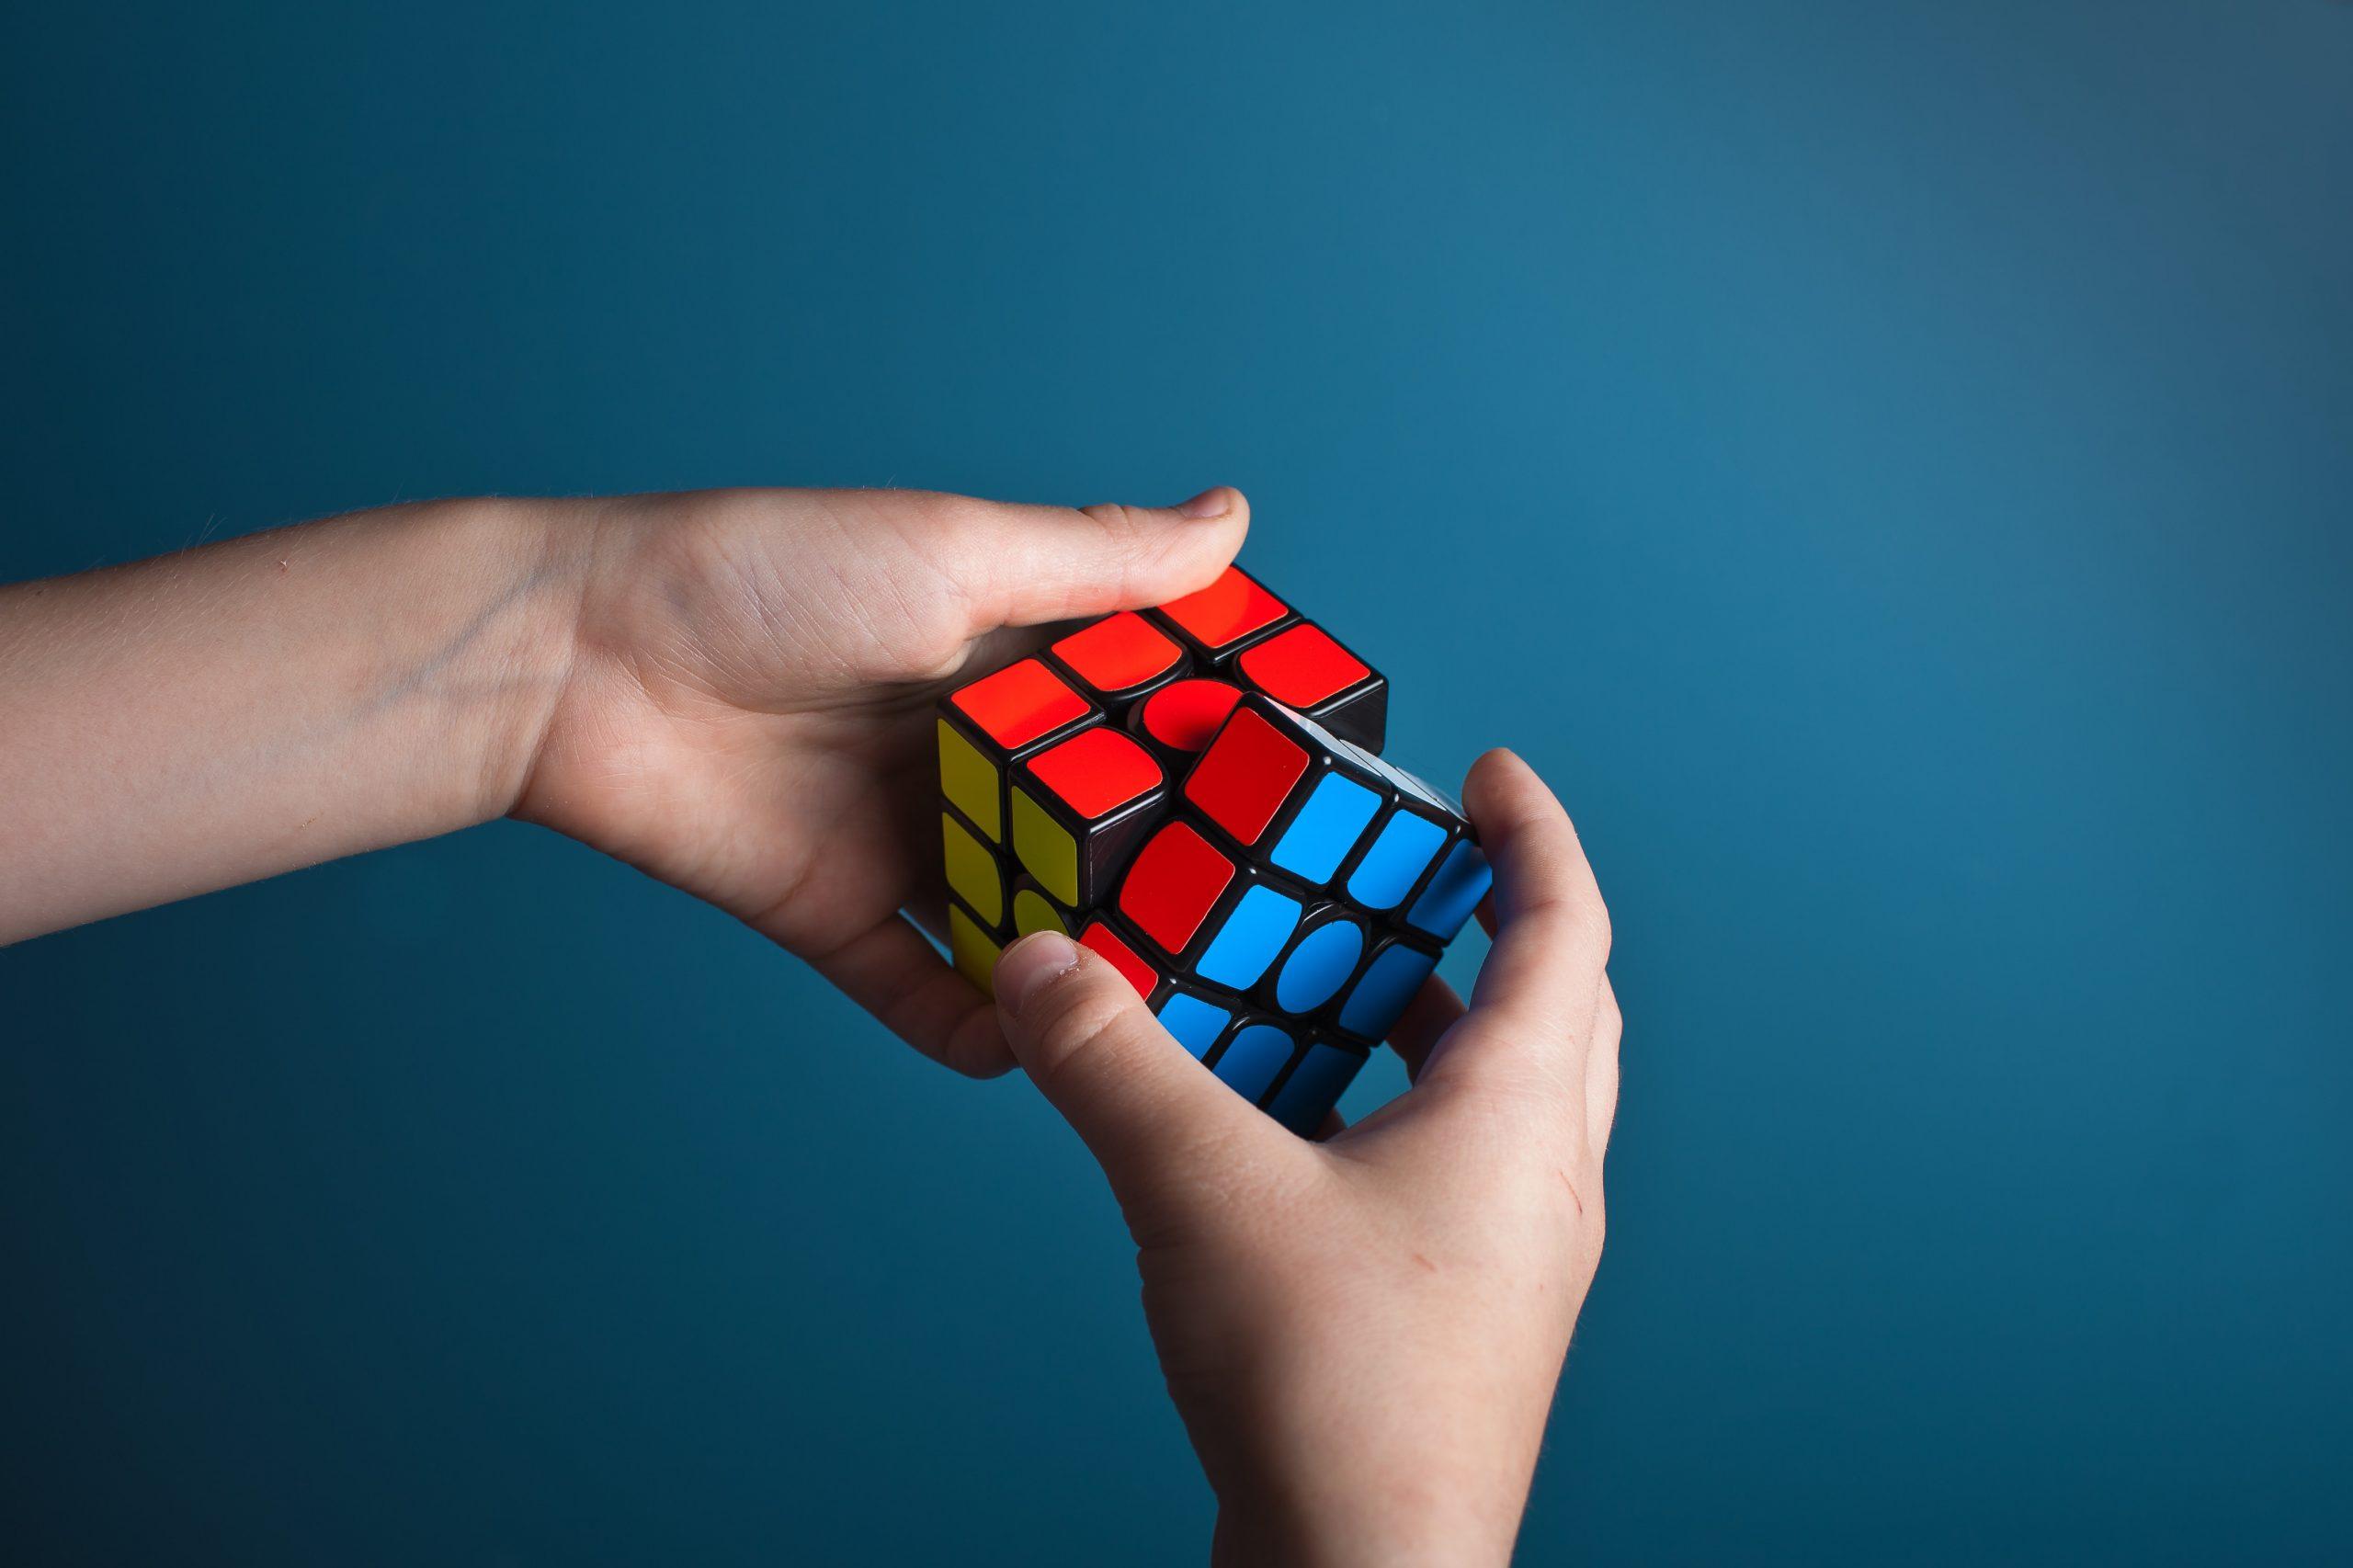 solve rubix cube, anxiety, stress, resolve